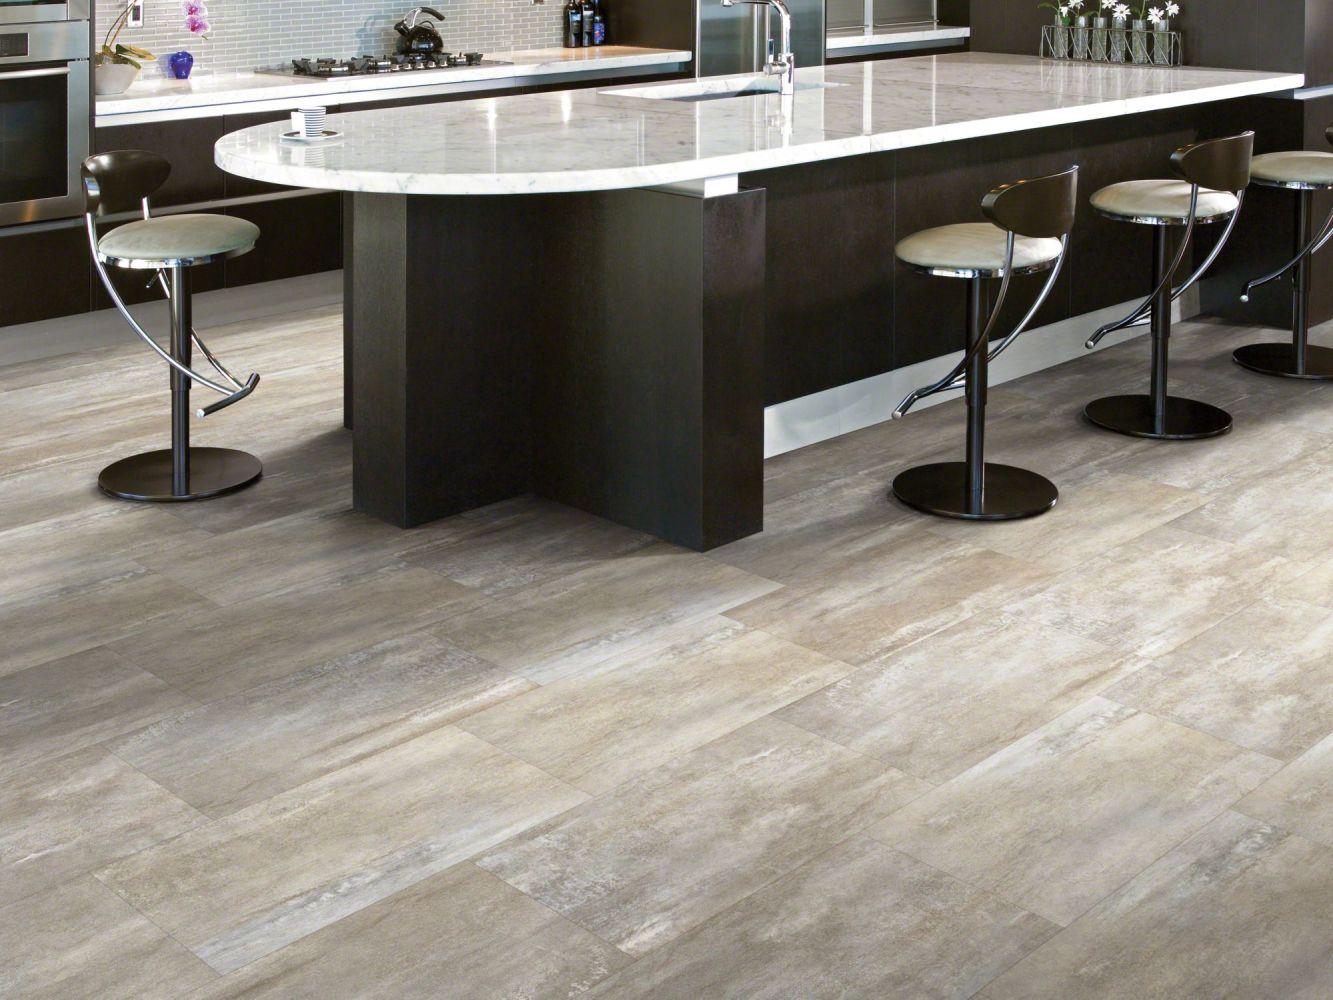 Shaw Floors Vinyl Property Solutions Easy Inspiration Jasmine 00244_VPS51